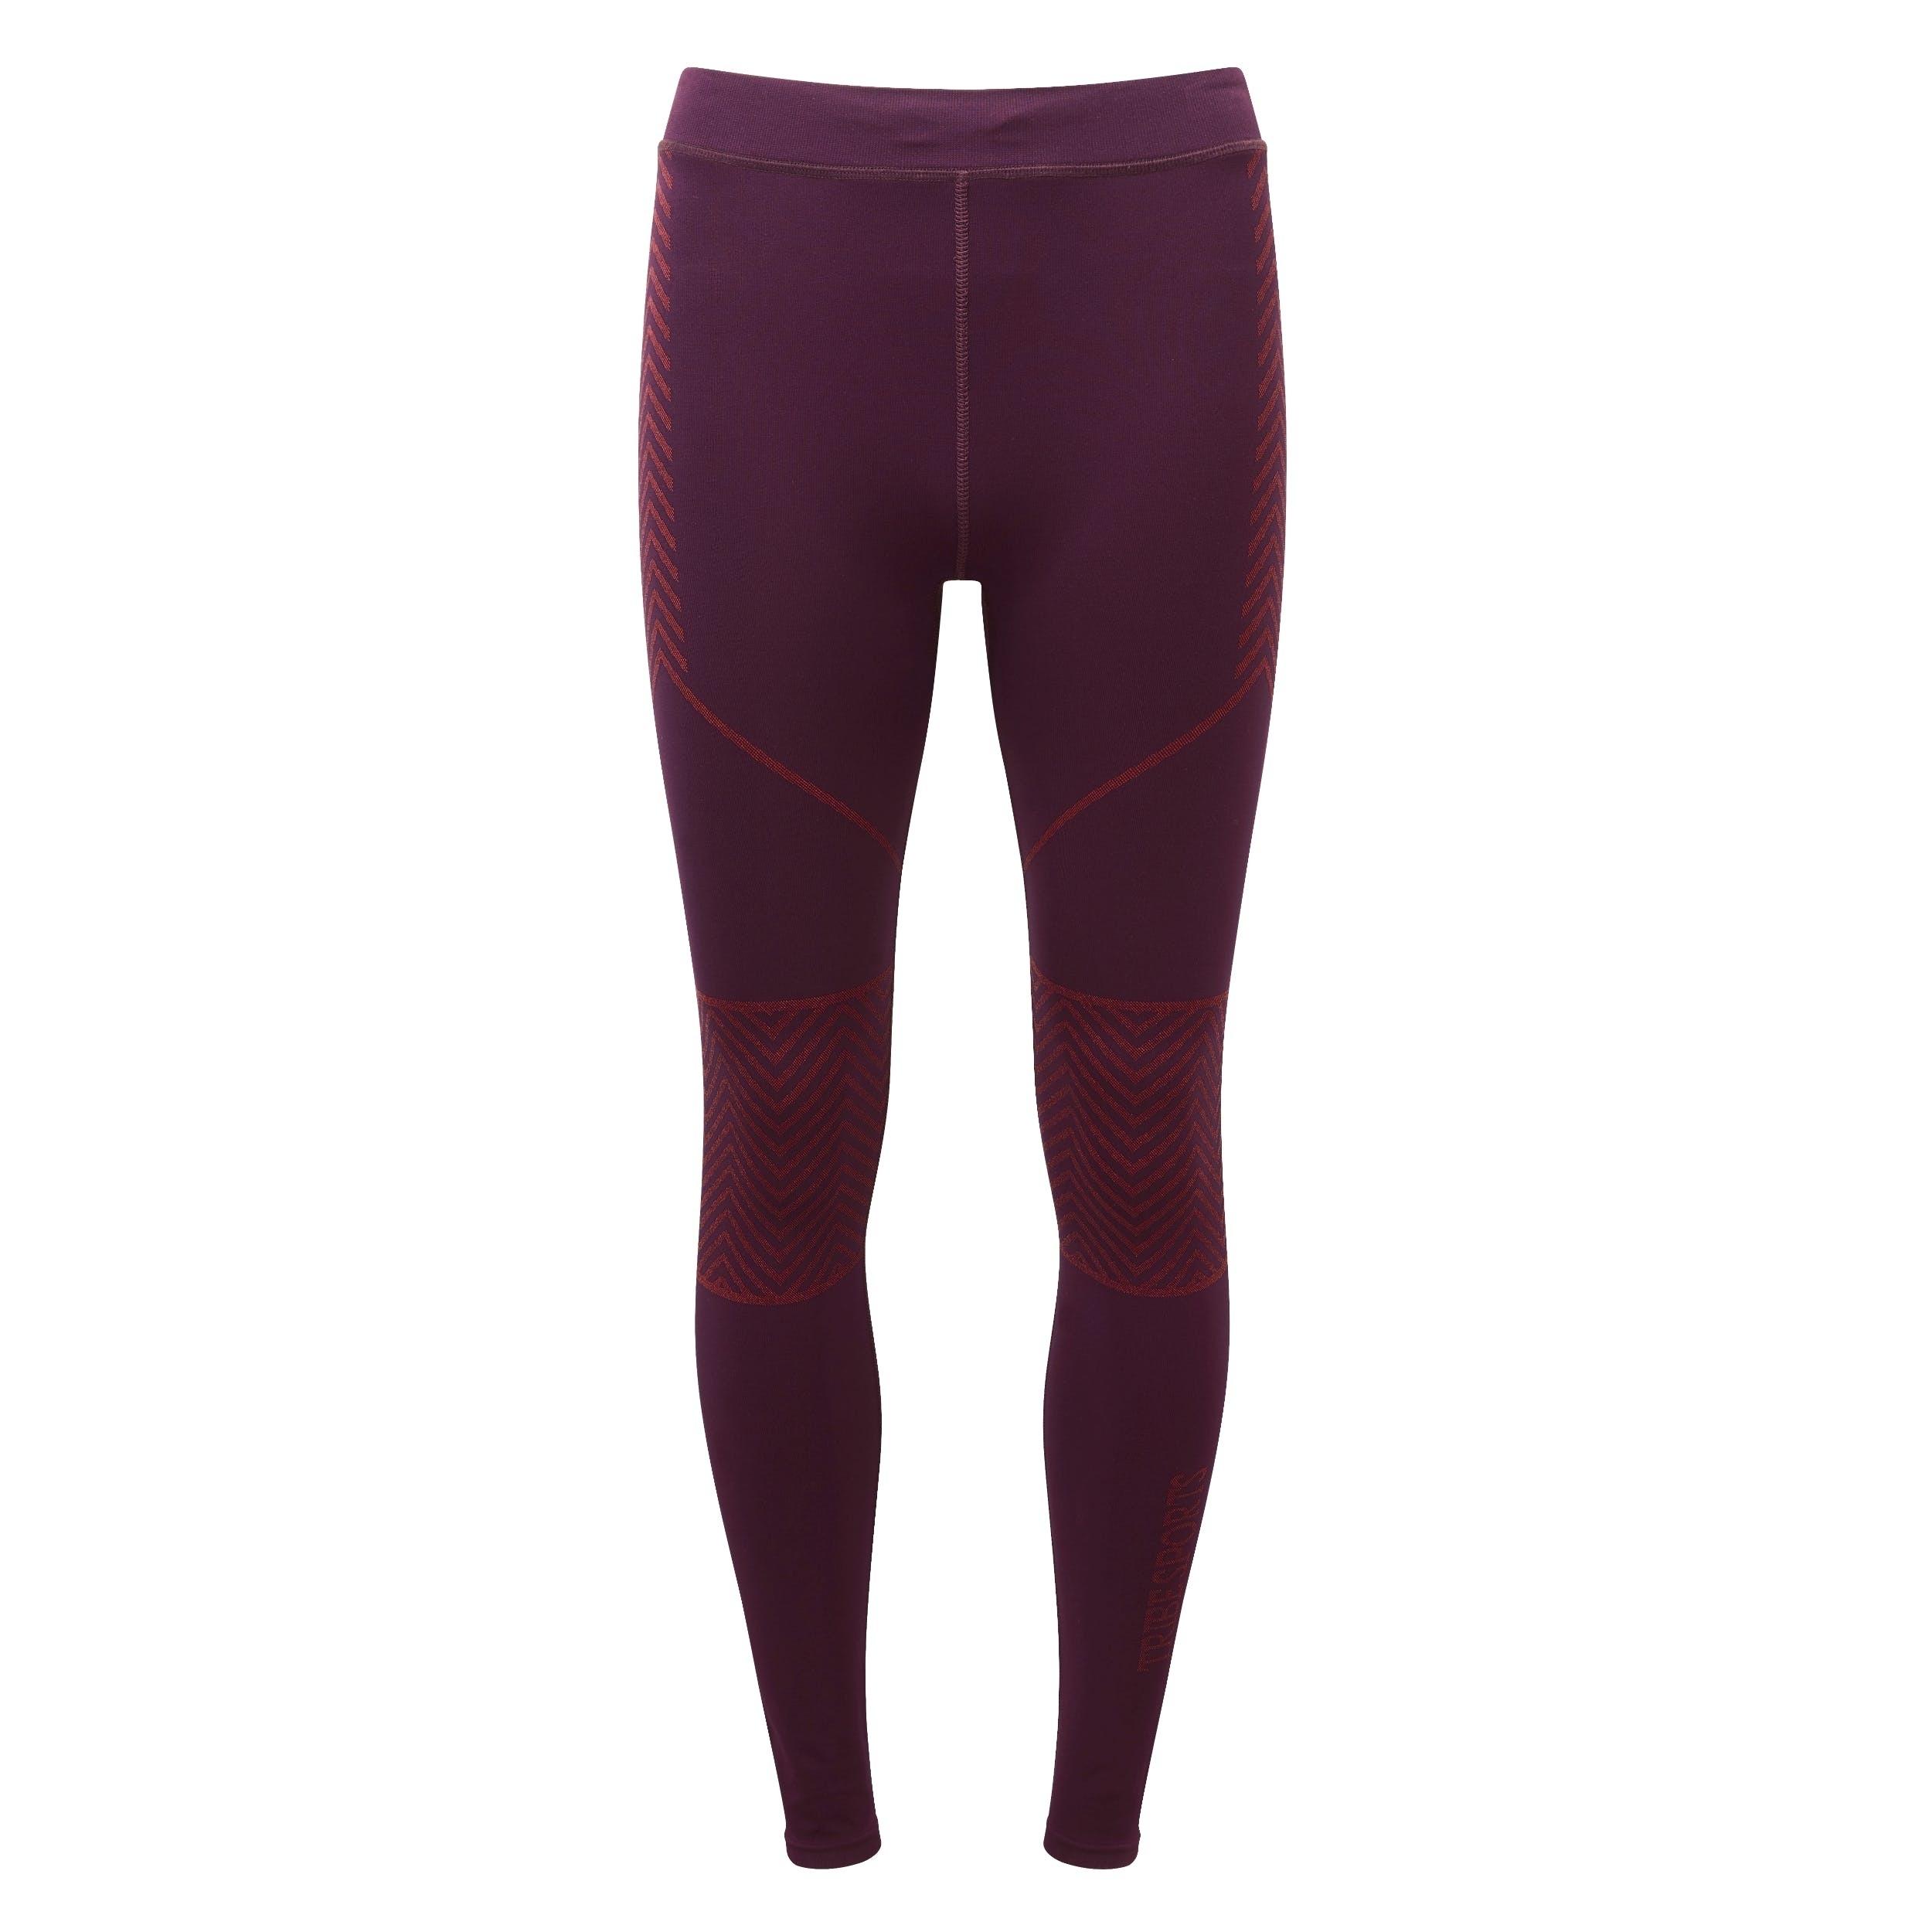 dc4ae858805a03 Women's Designer Activewear & Gym Clothes - Harvey Nichols